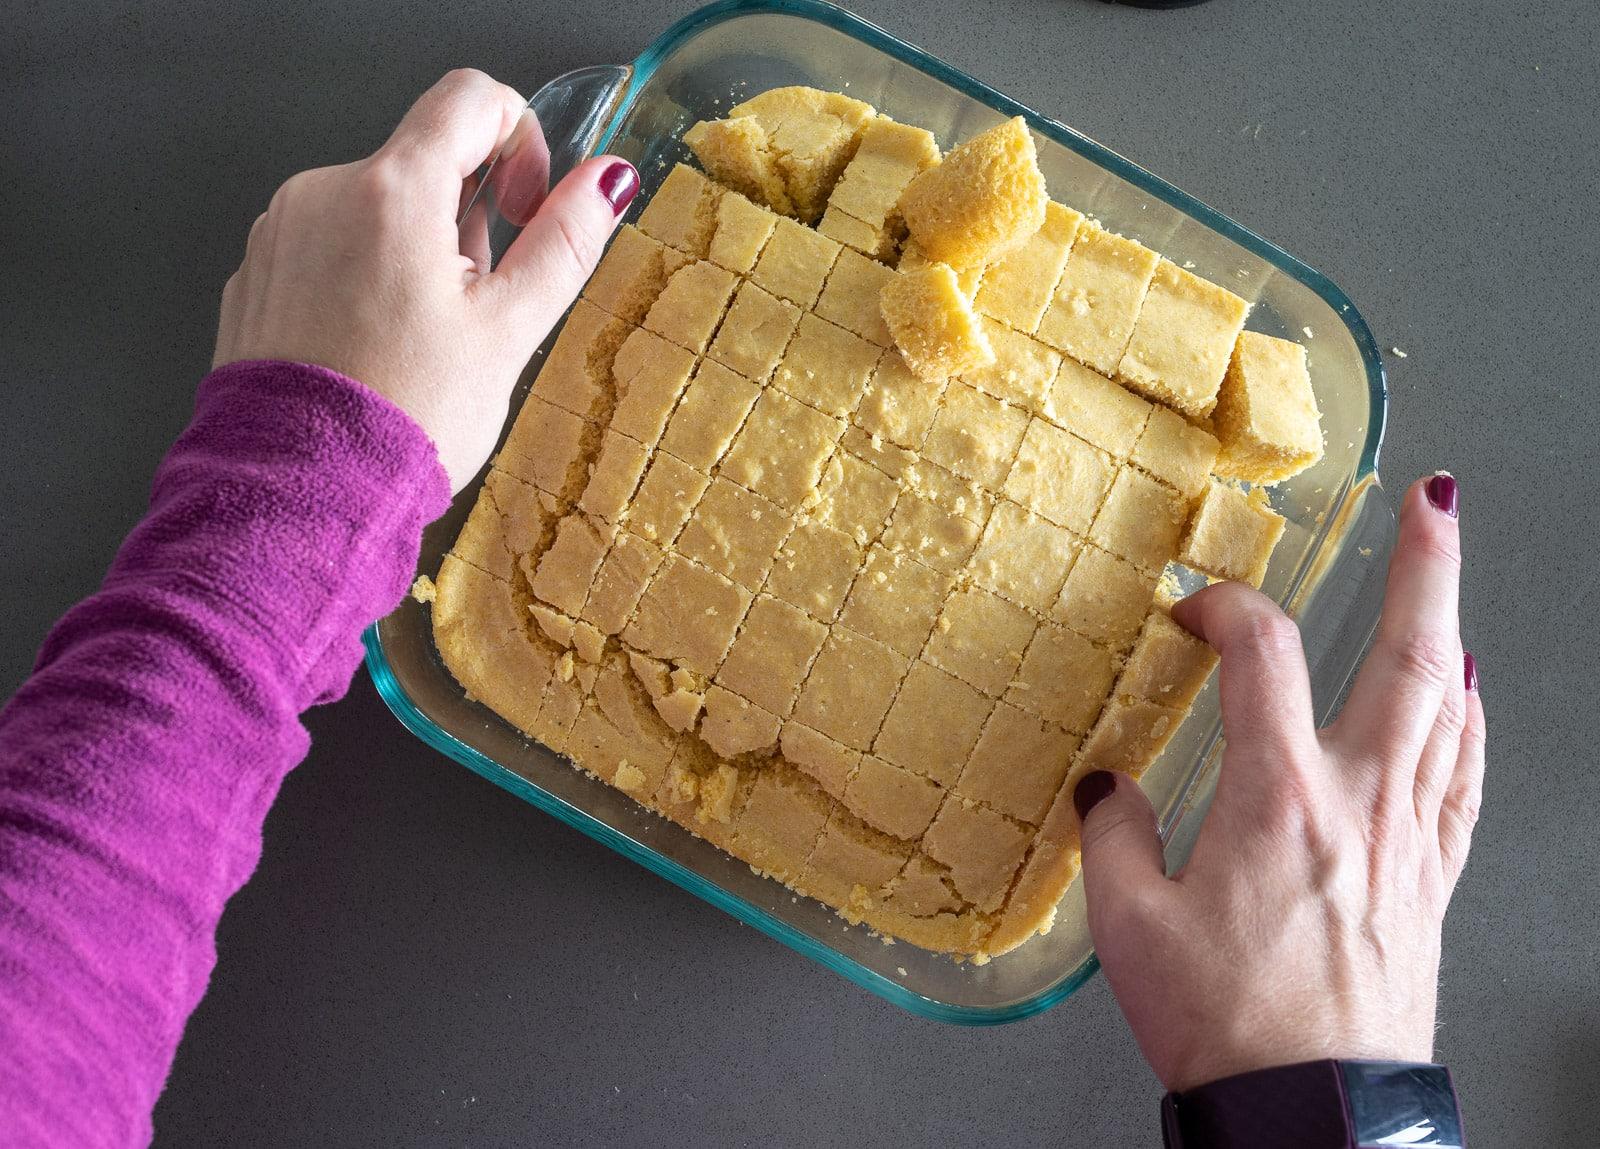 Baked Cornbread in an 8x8 glass pan.